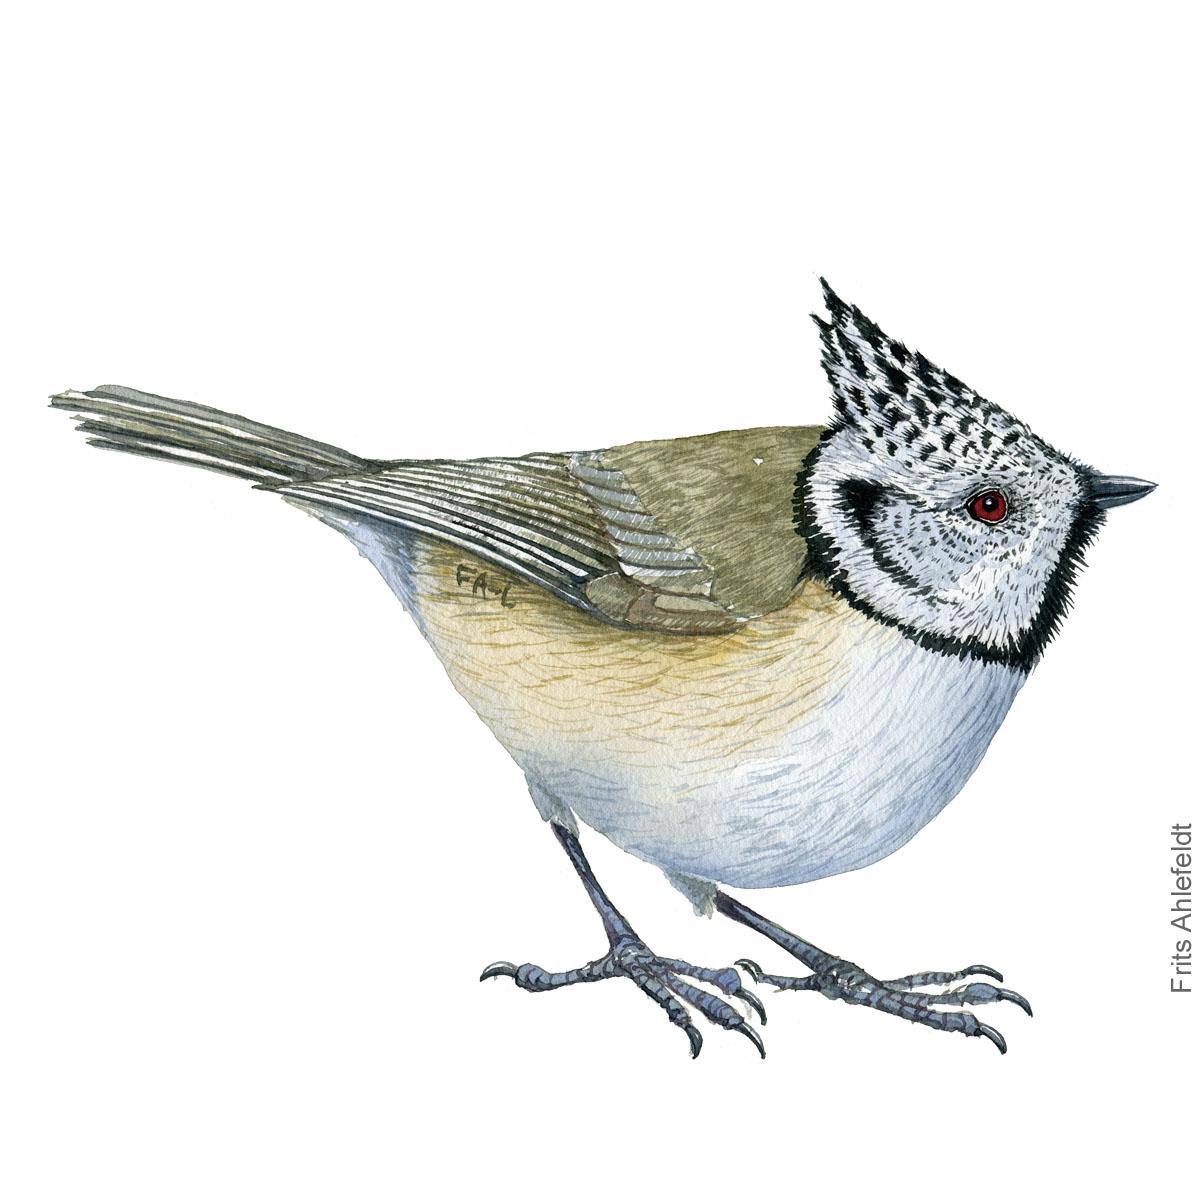 Topmejse - European crested tit bird watercolor illustration. Artwork by Frits Ahlefeldt. Fugle akvarel